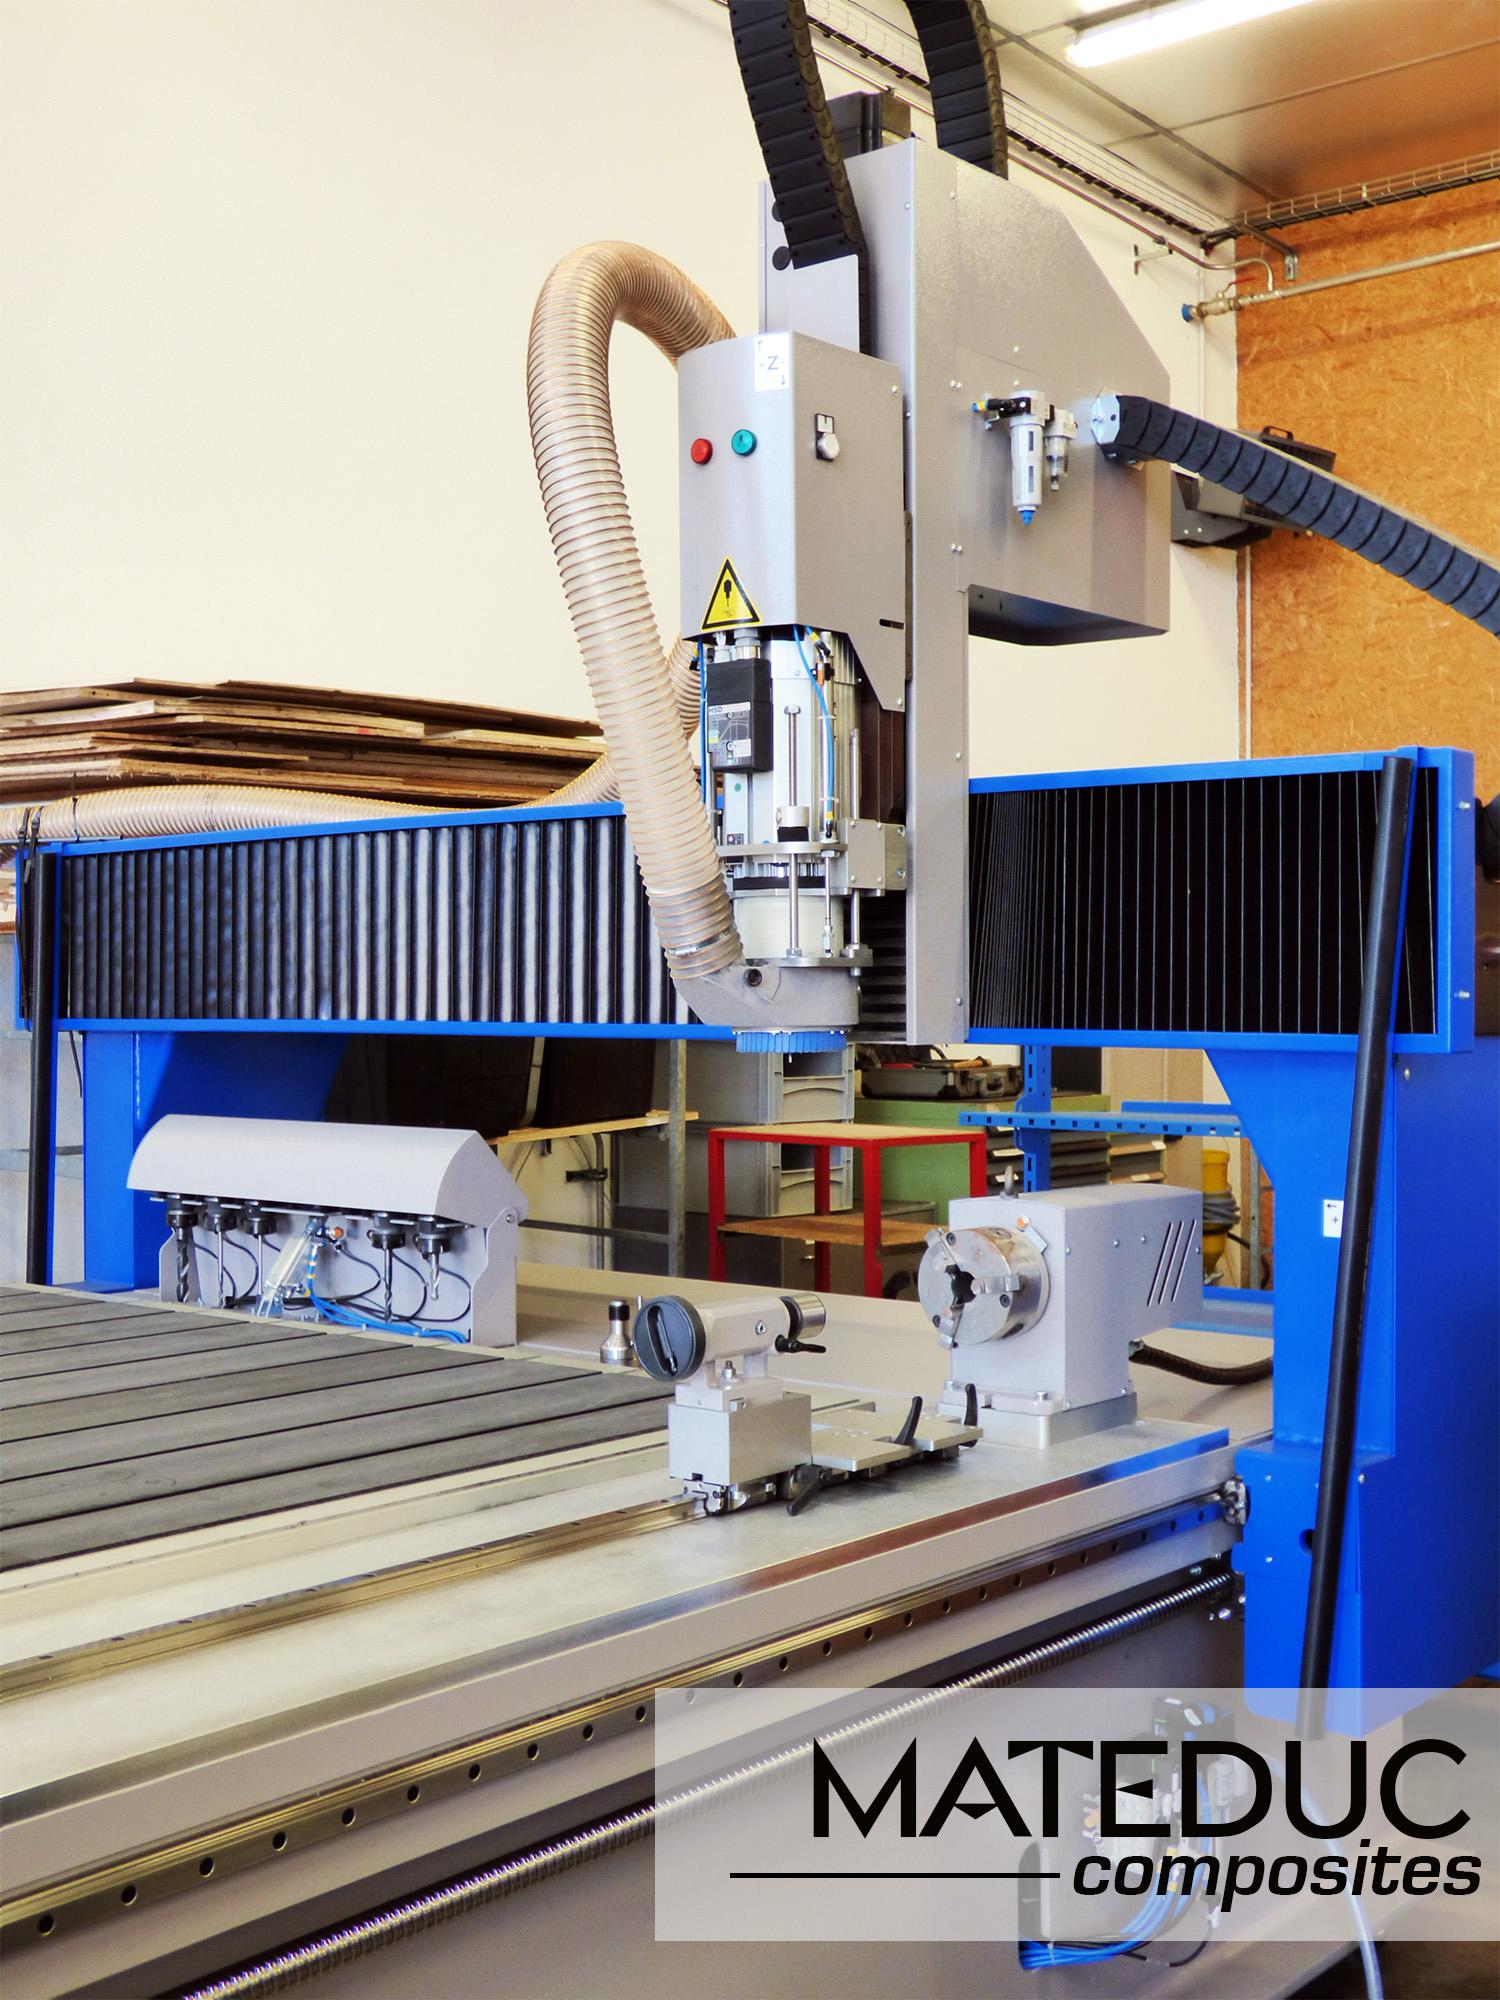 Usinage carbone et matériaux composites - www.tubecarbone.com